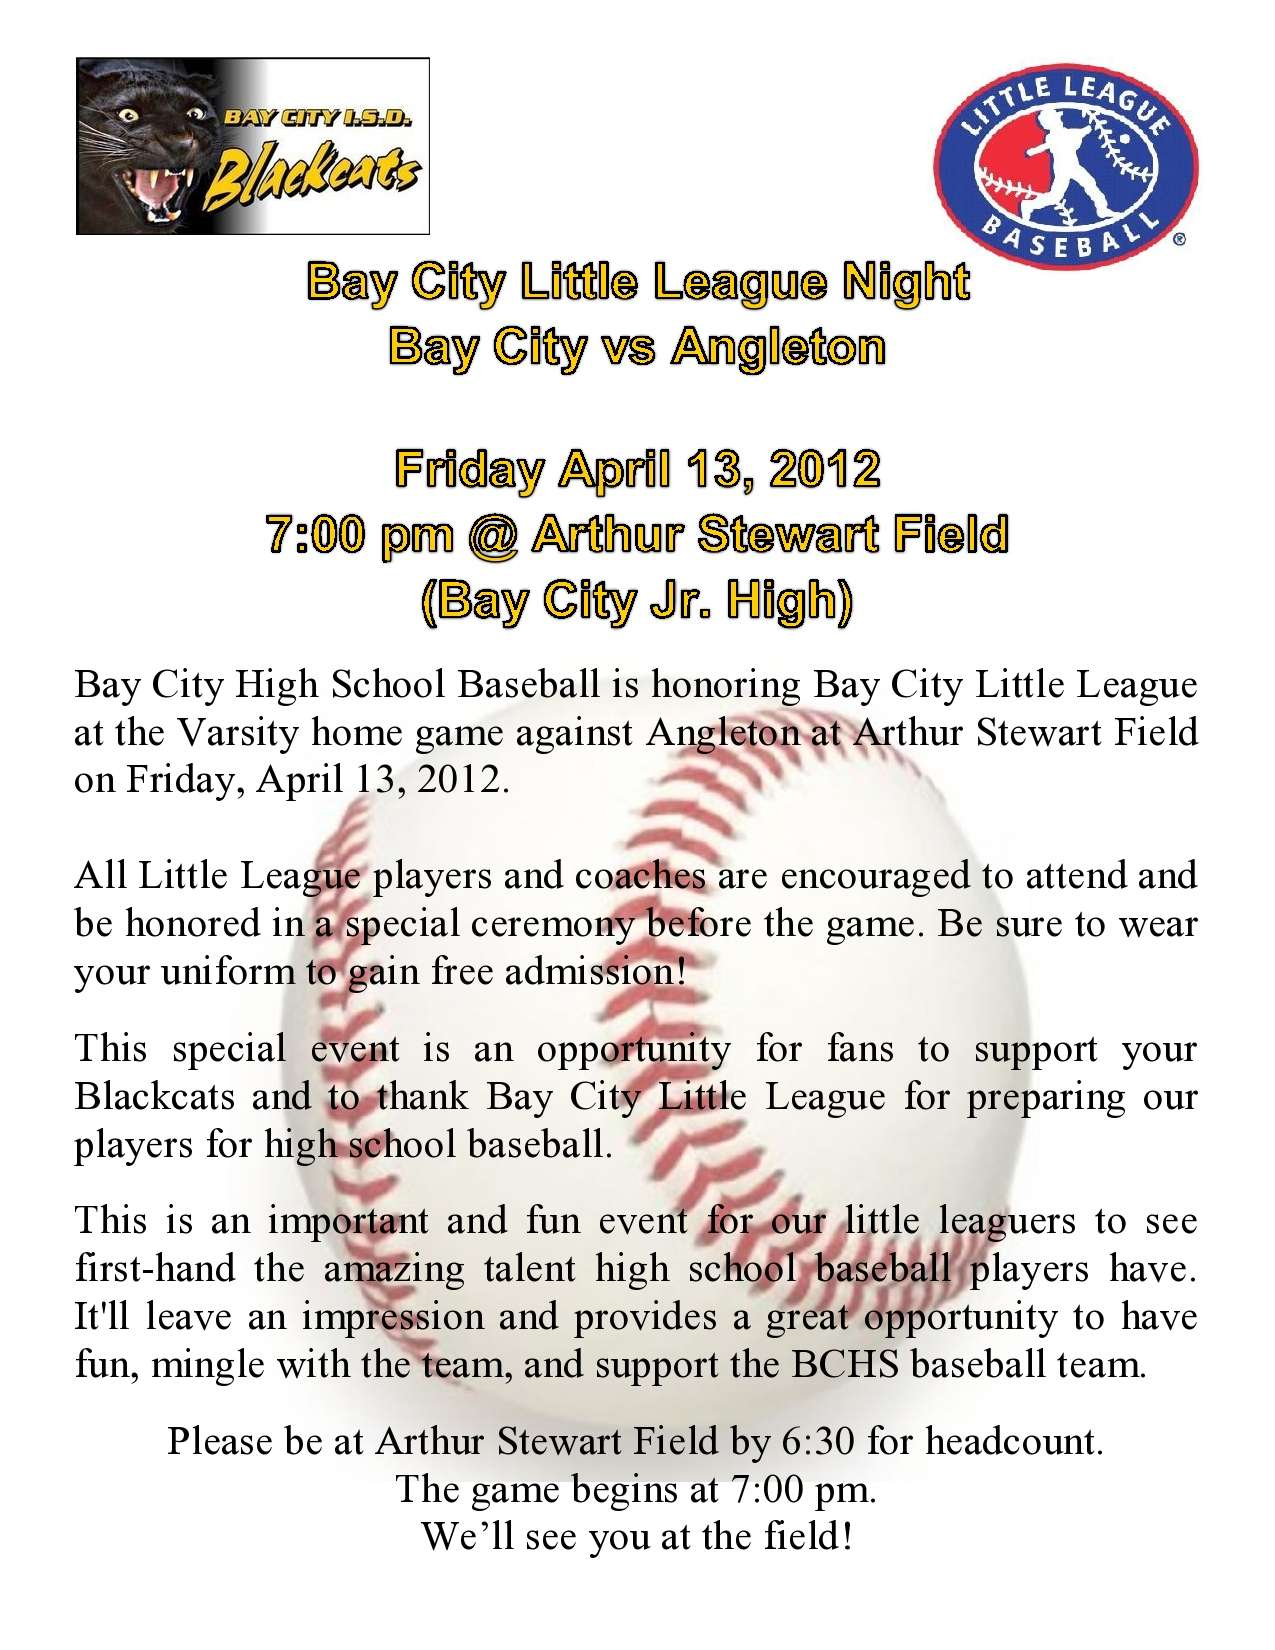 Bay City Little League Night 2012